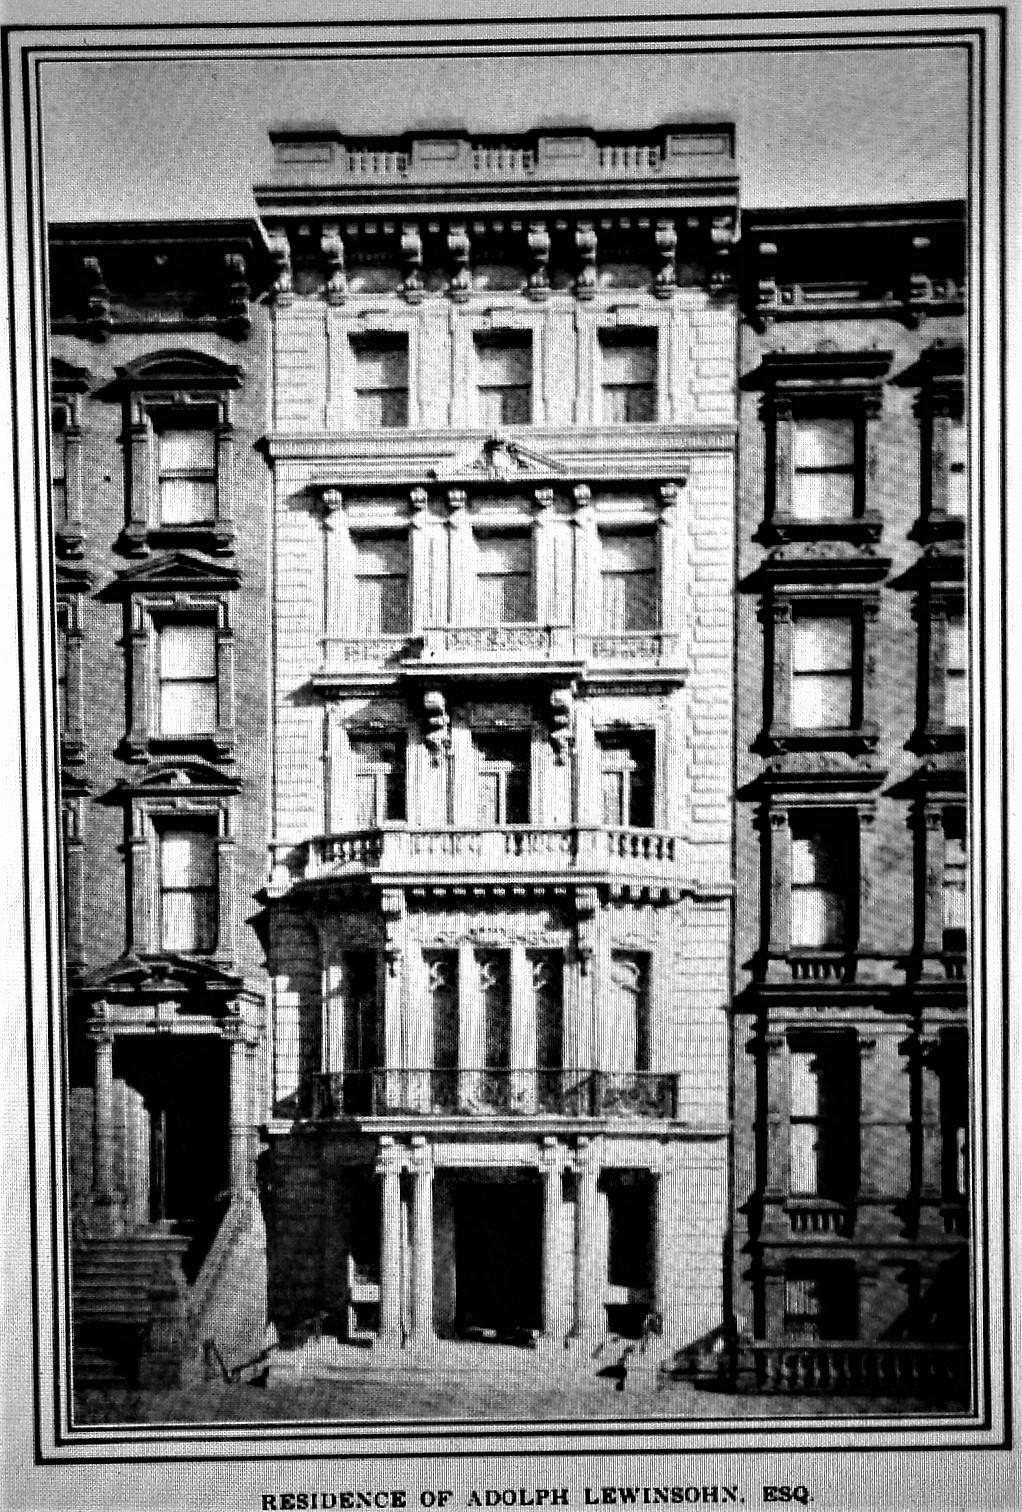 Daytonian in Manhattan: The Lost Adolph Lewisohn Mansion - 9